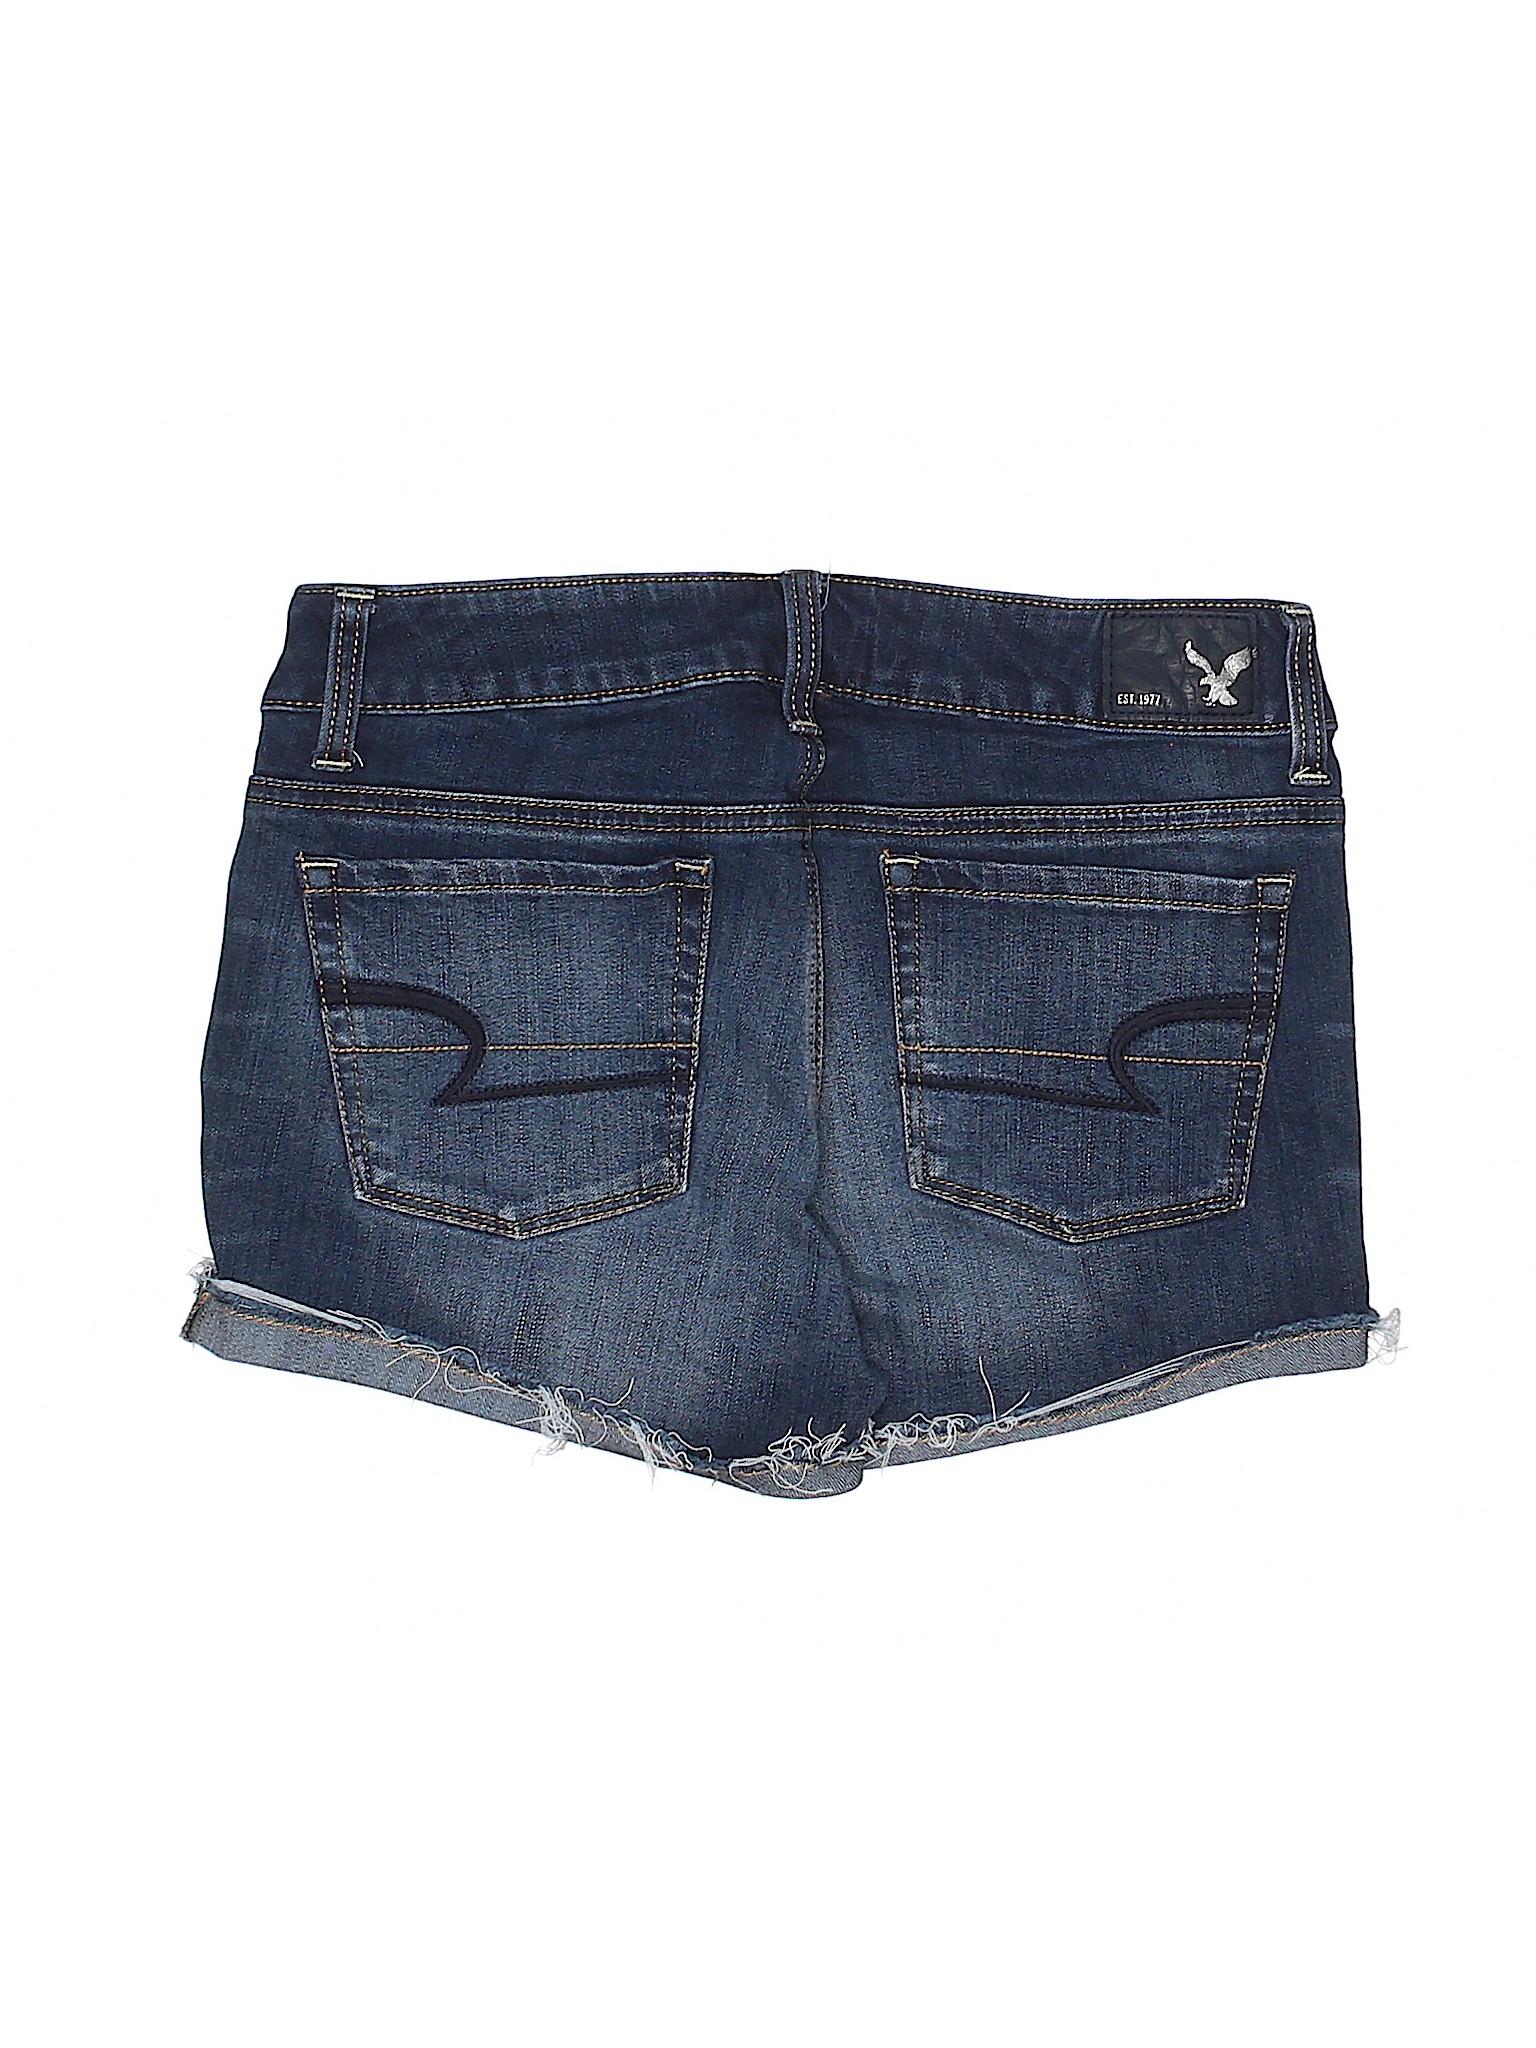 Boutique Shorts Denim Eagle American Outfitters rF7gPfAr